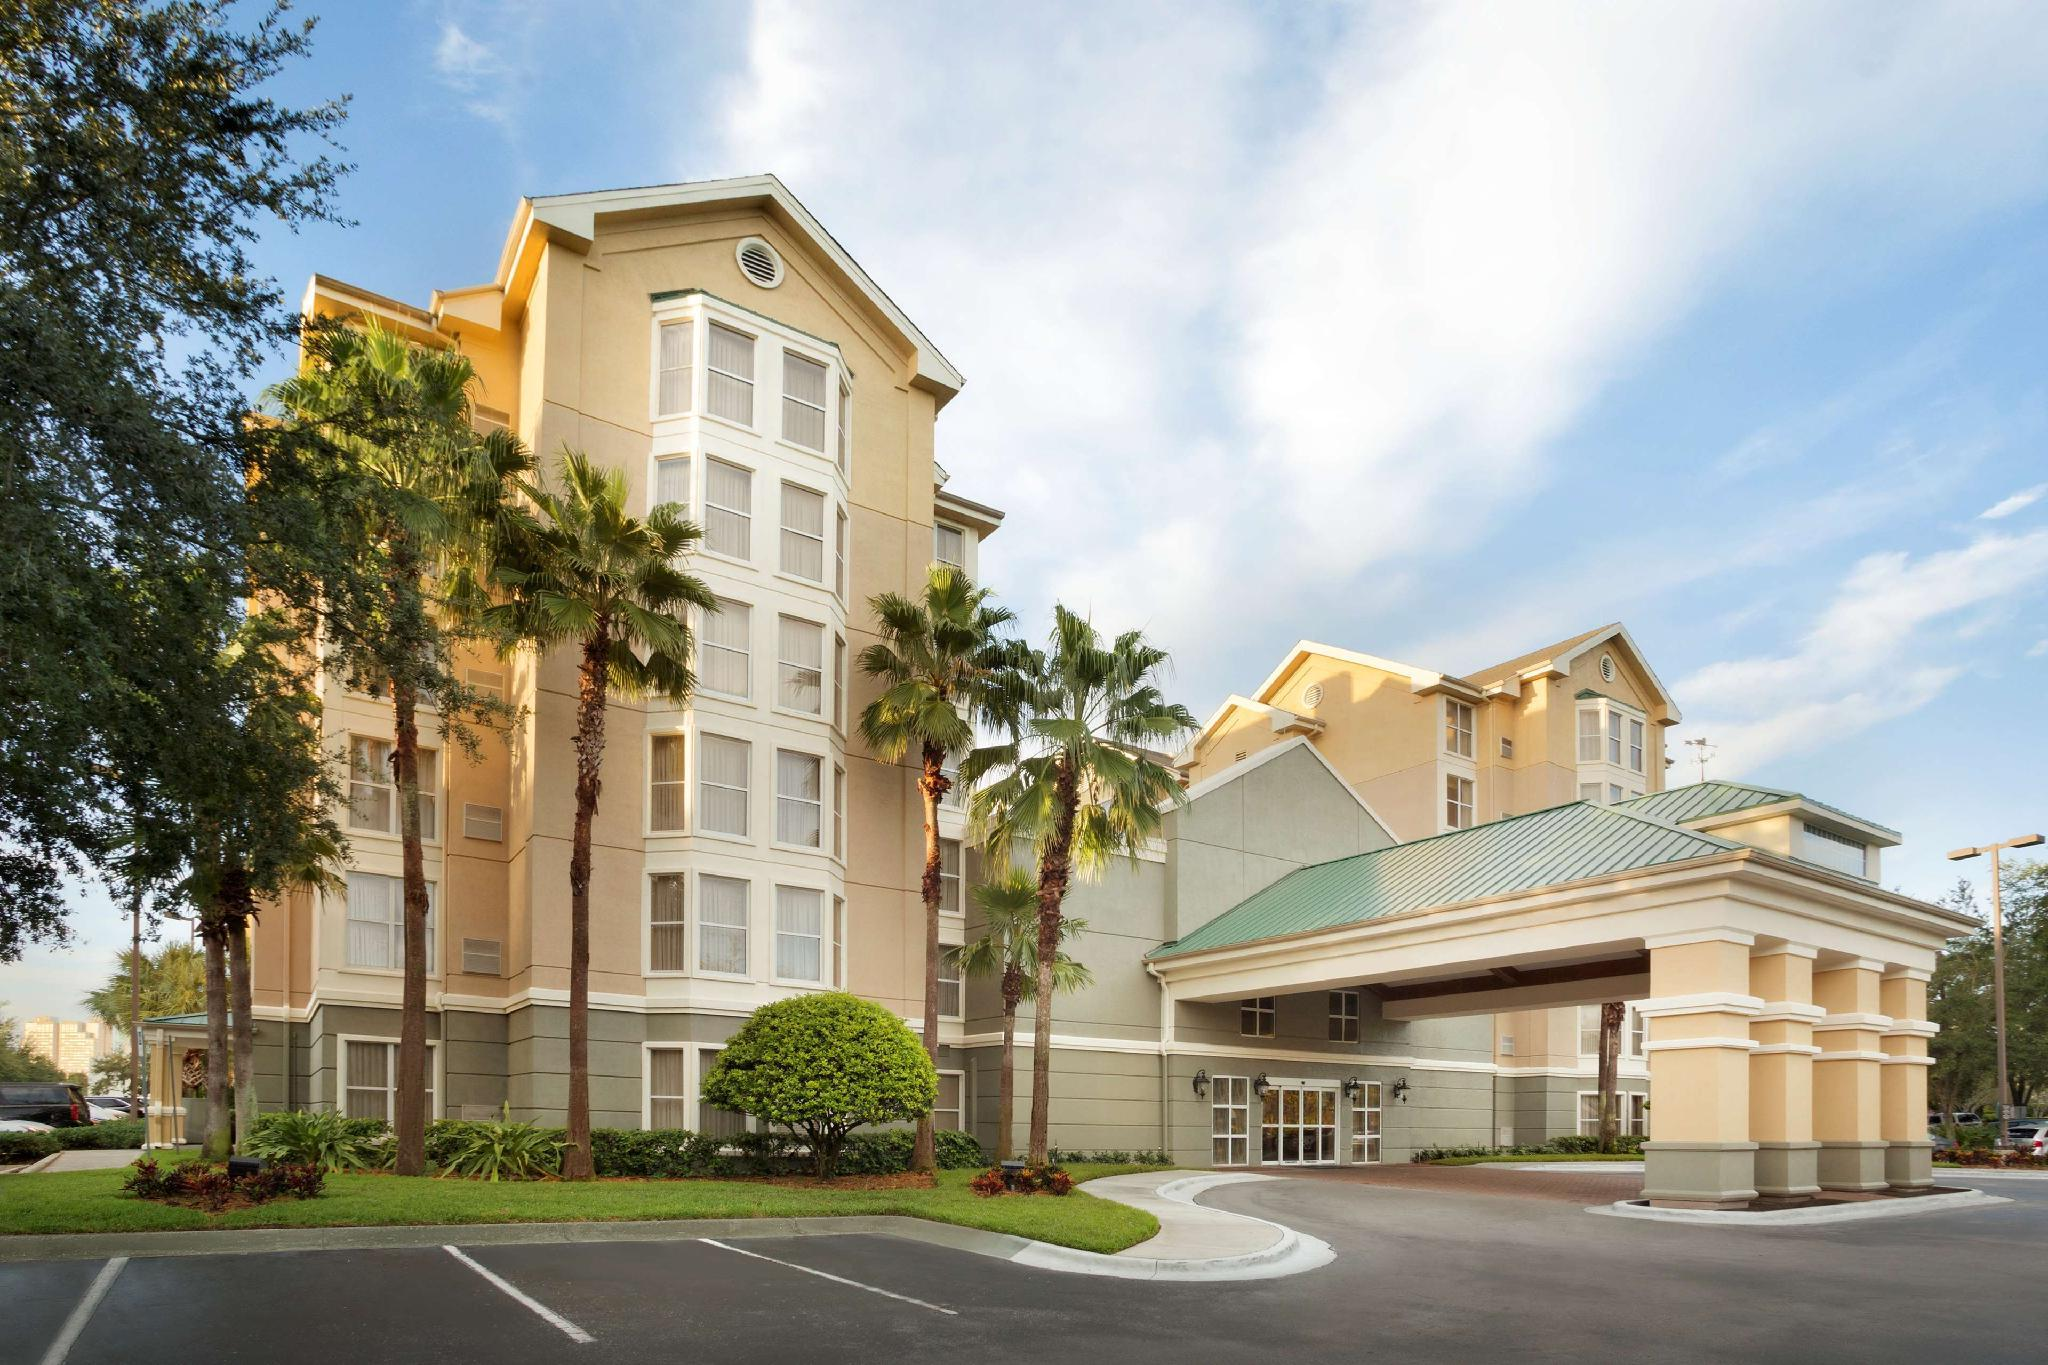 Homewood Suites Orlando International Drive